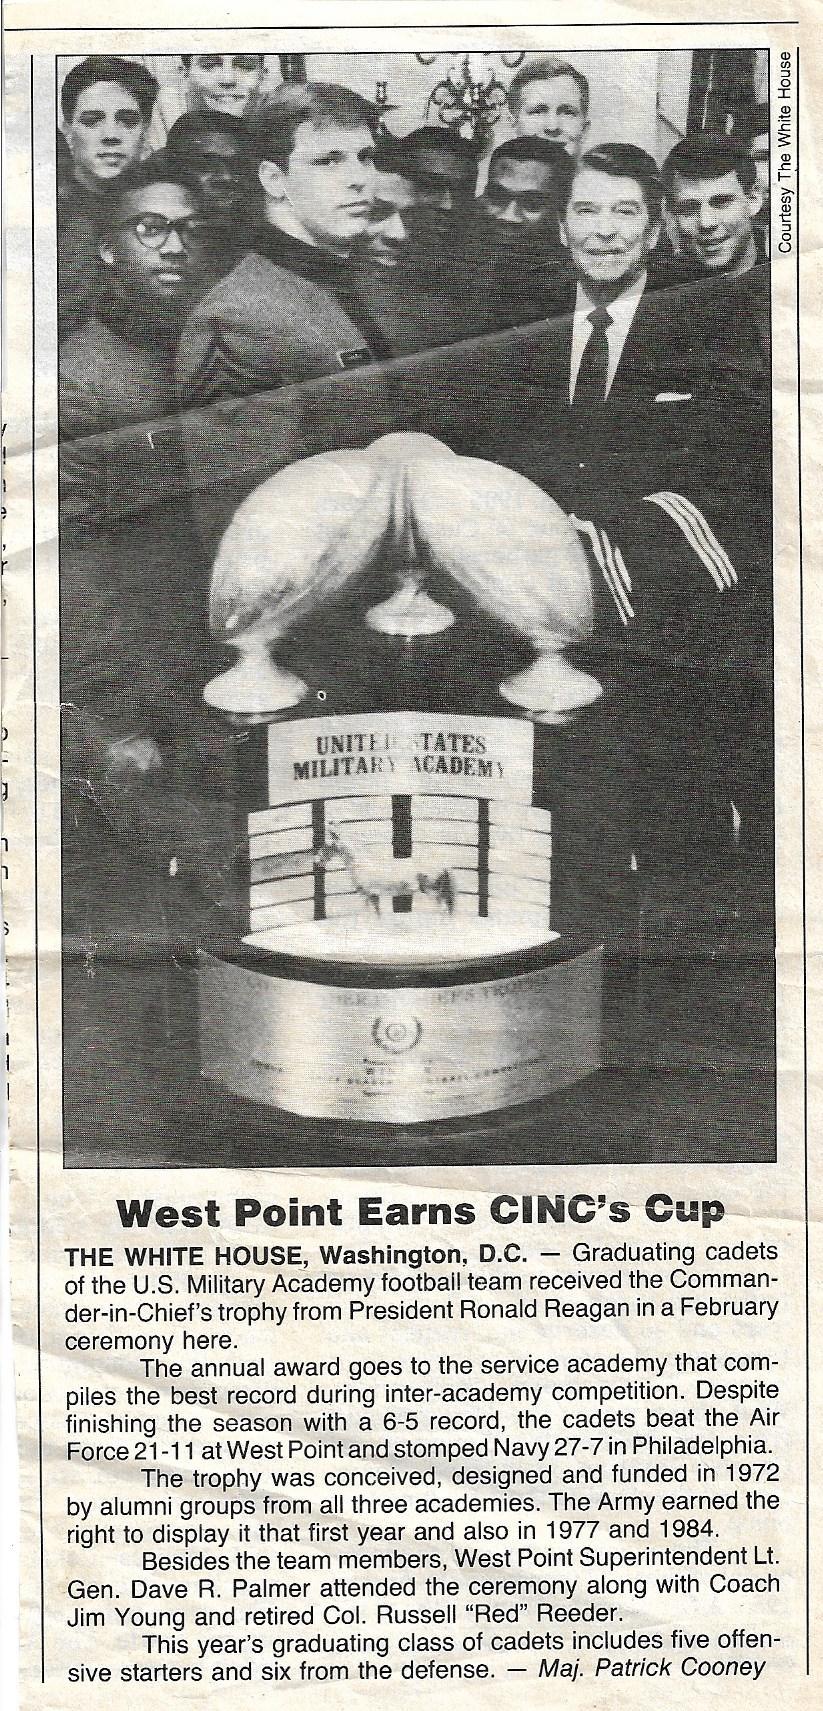 ArmyFB_1986_CINCs-CUP_SoldiersMagazine